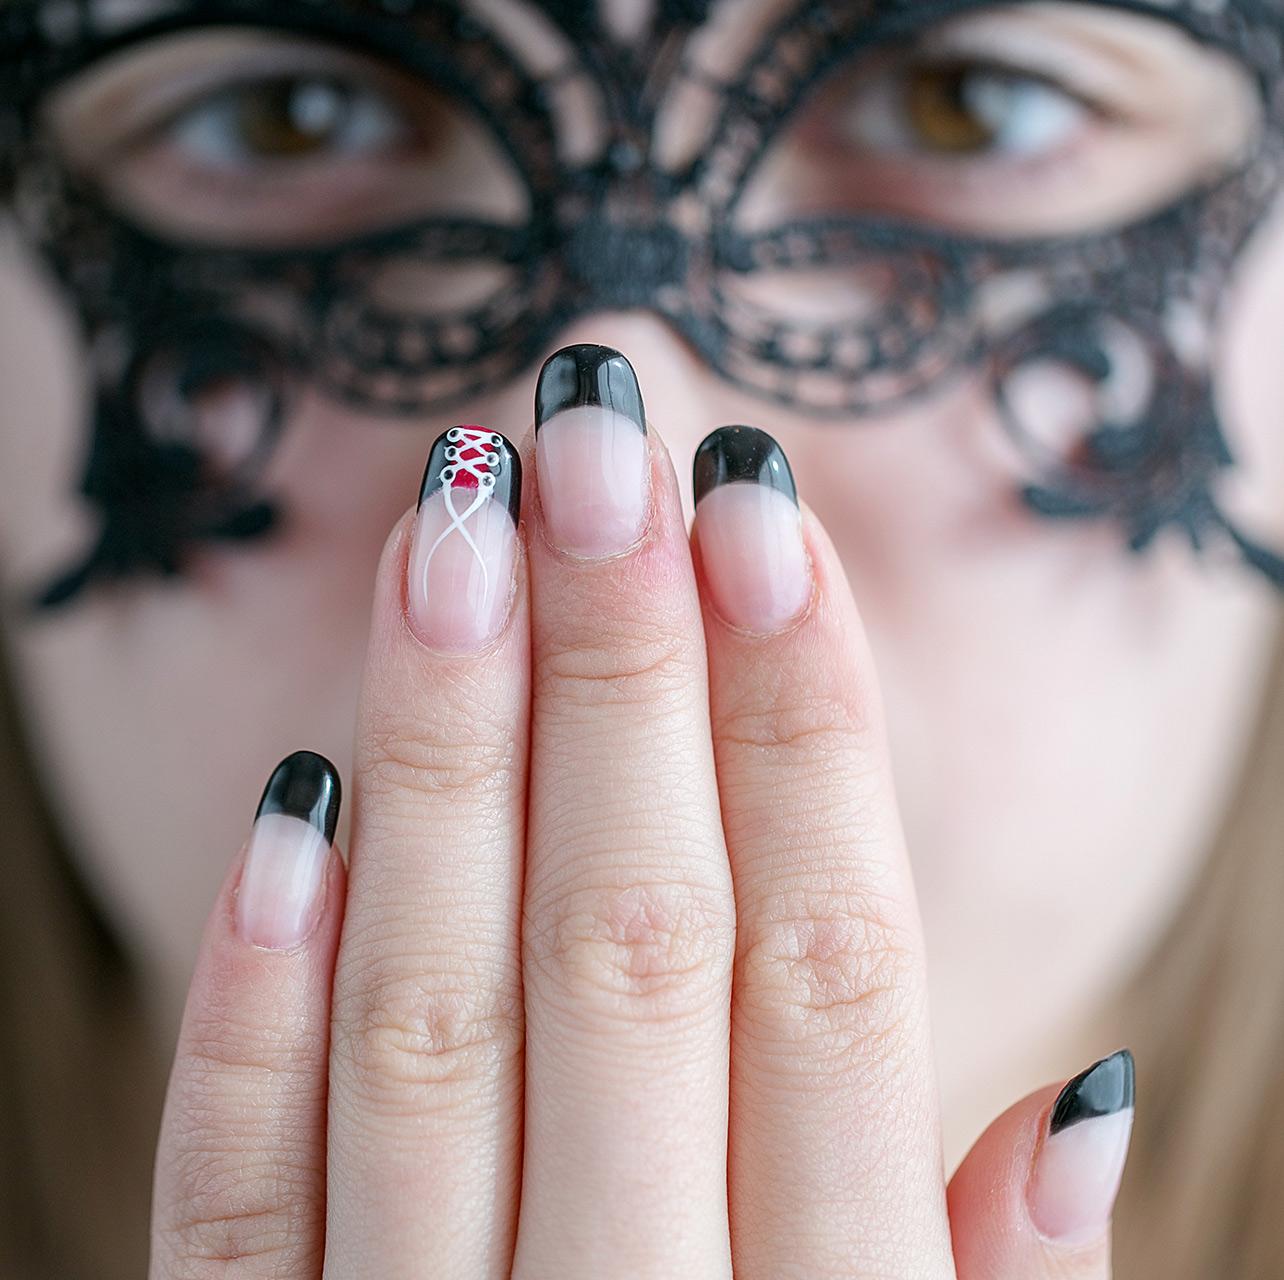 Vos Ongles Fée - Le plus qui embellira vos ongles : le Nail art !